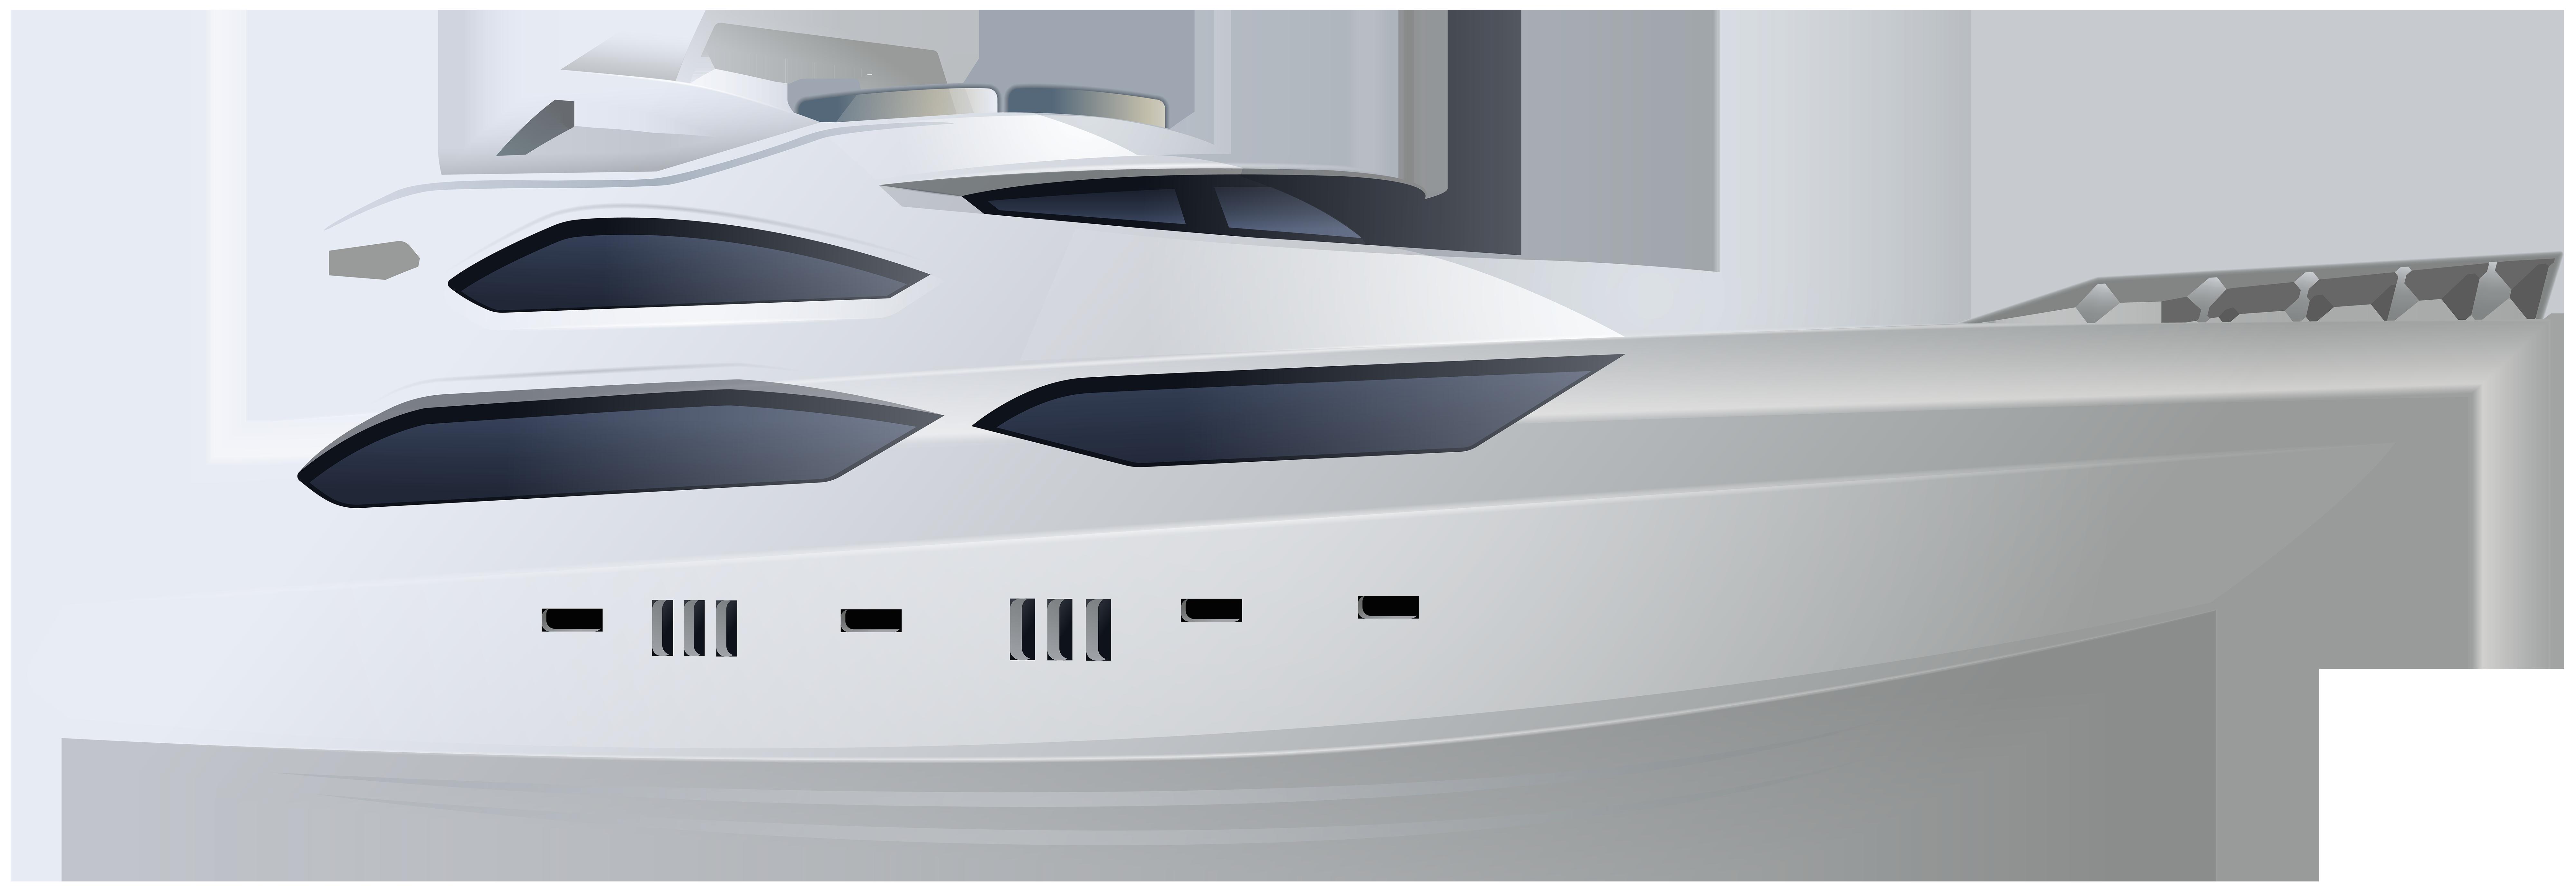 jpg free Png clip art image. Yacht clipart border